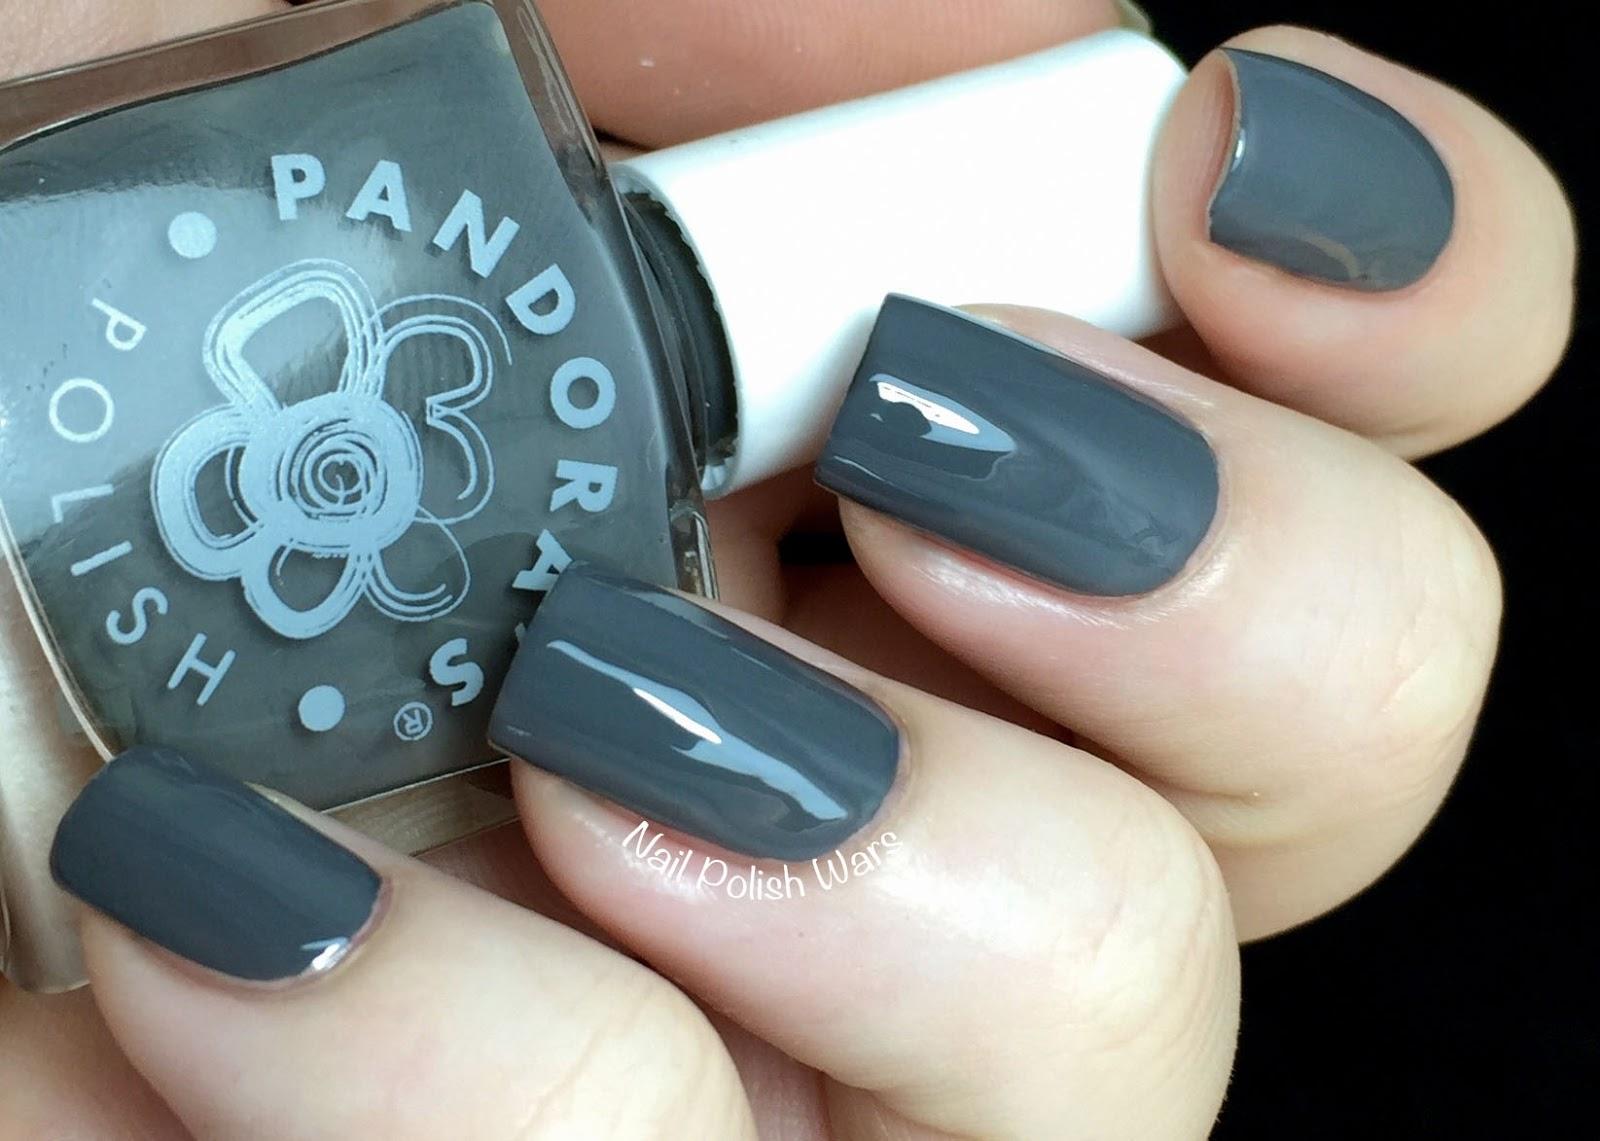 Pandora's Polish